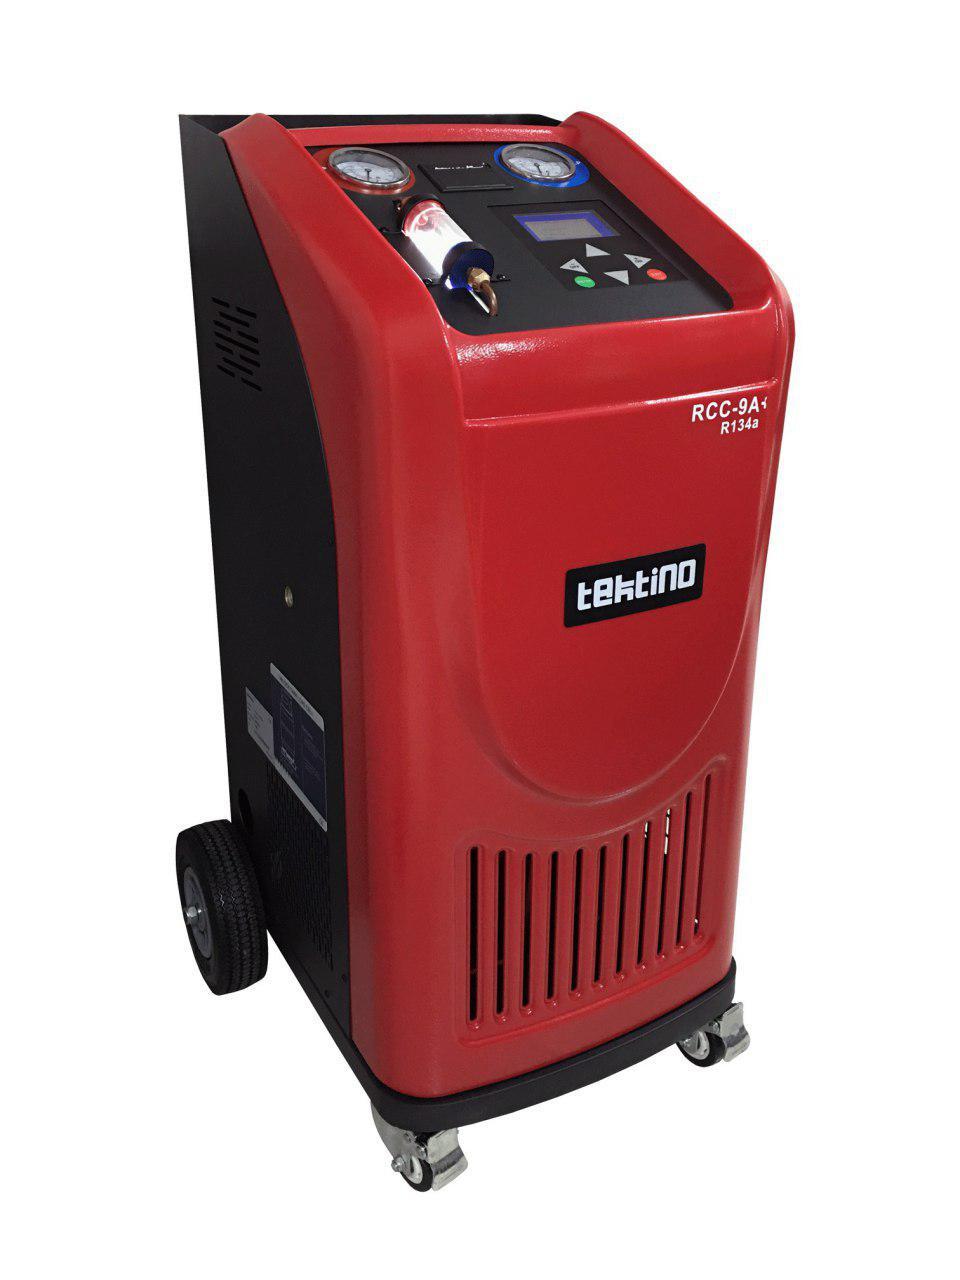 دستگاه شارژ گاز کولر تکتینو مدل 90A-pic1